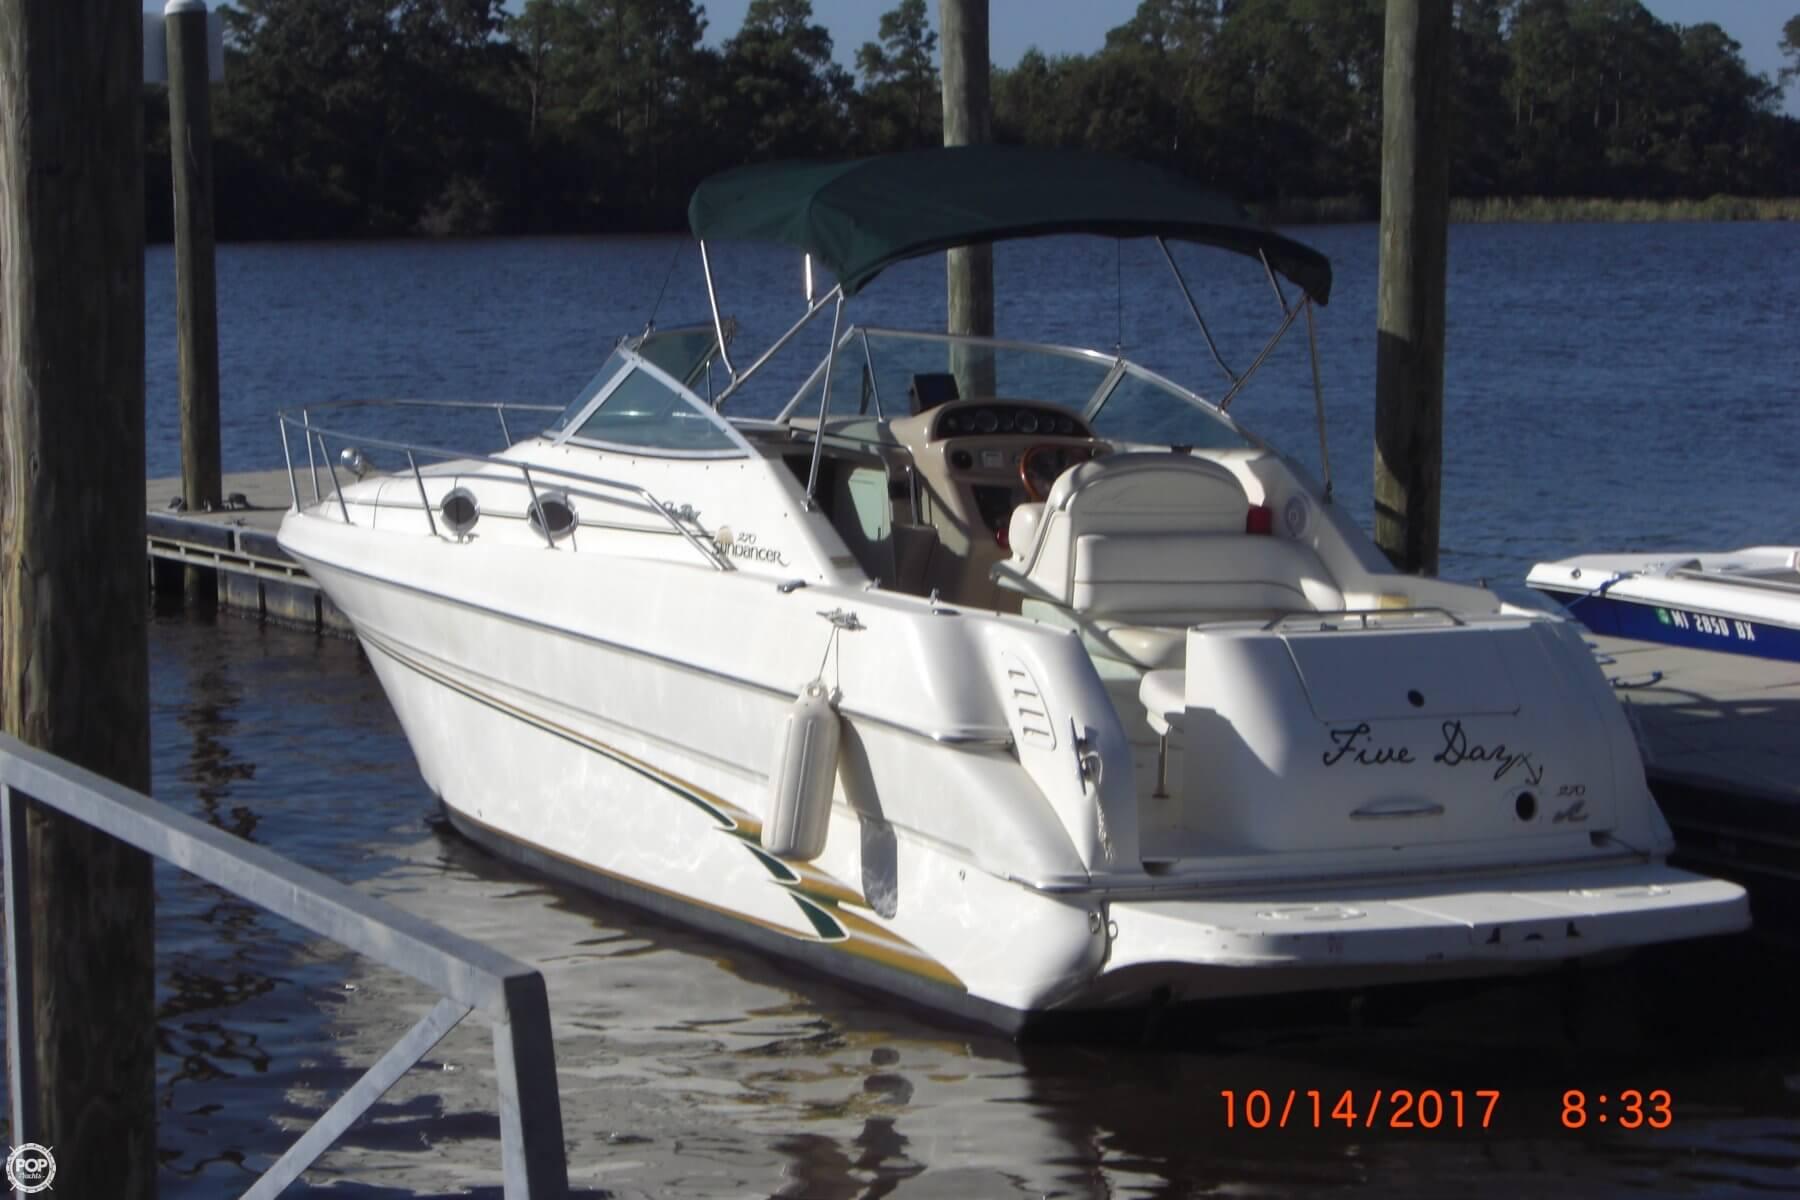 sea ray warranty 2001 jaguar s type fuel pump wiring diagram sold 270 sundancer boat in gulfport ms 136079 1999 for sale